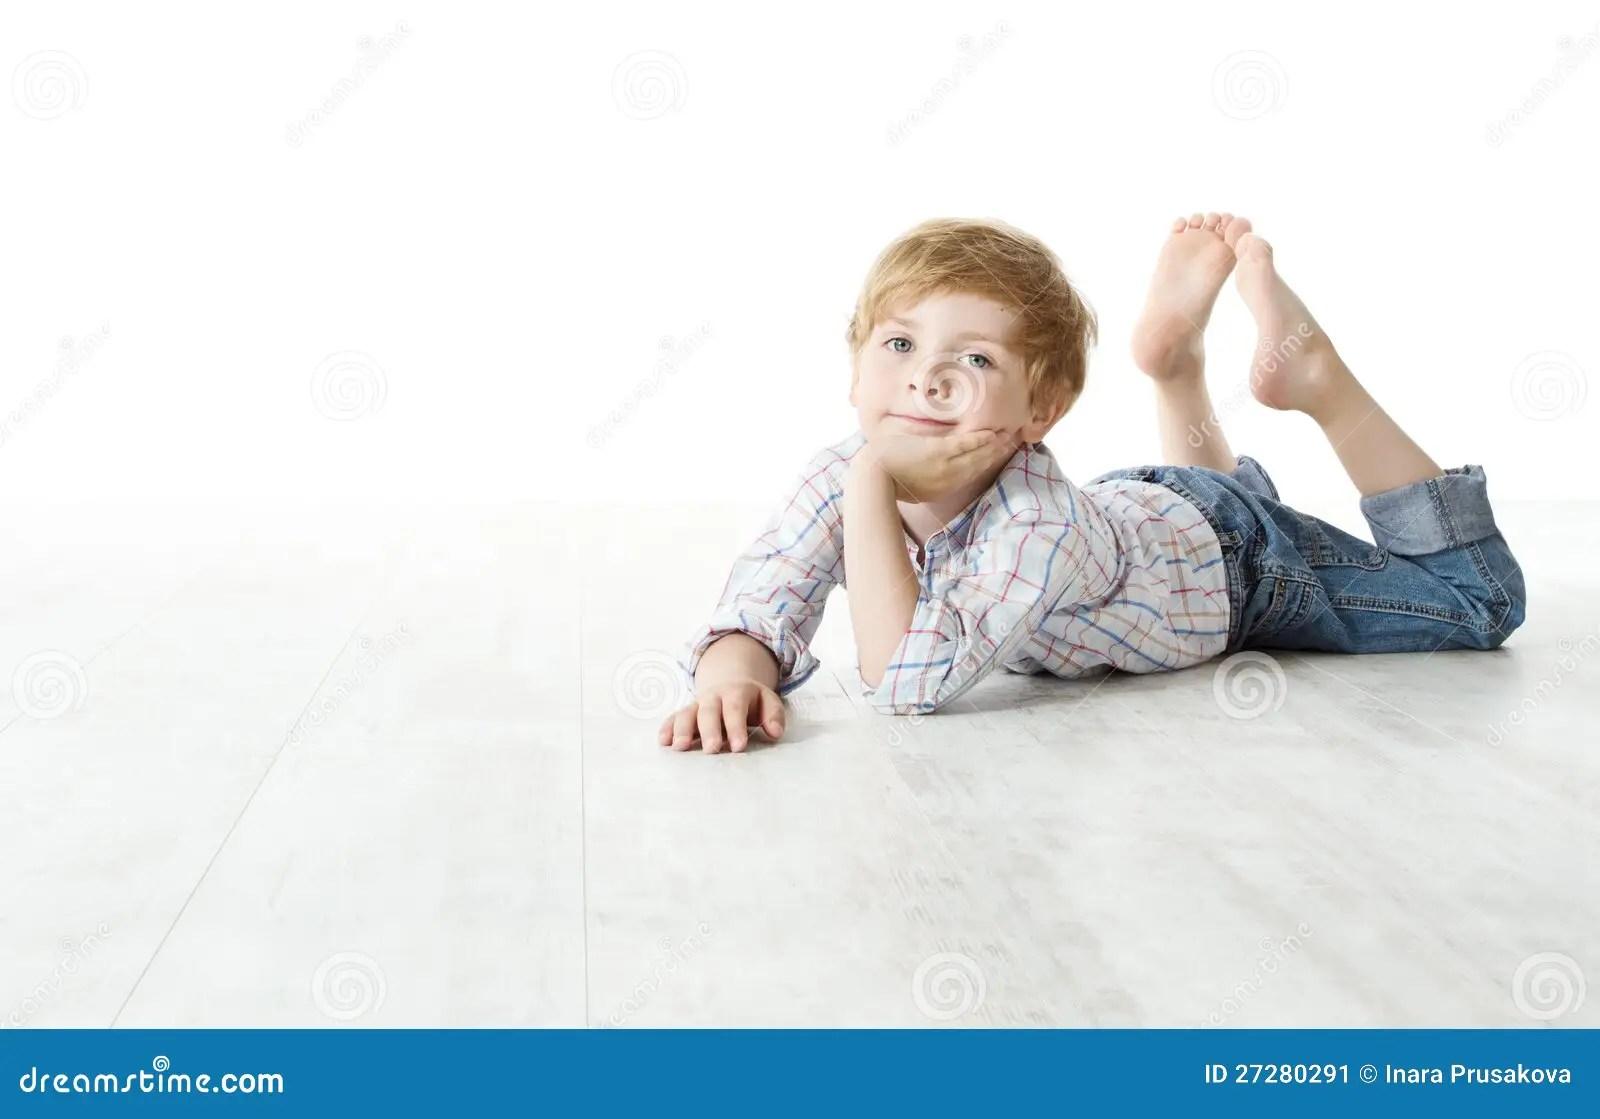 child lying down on